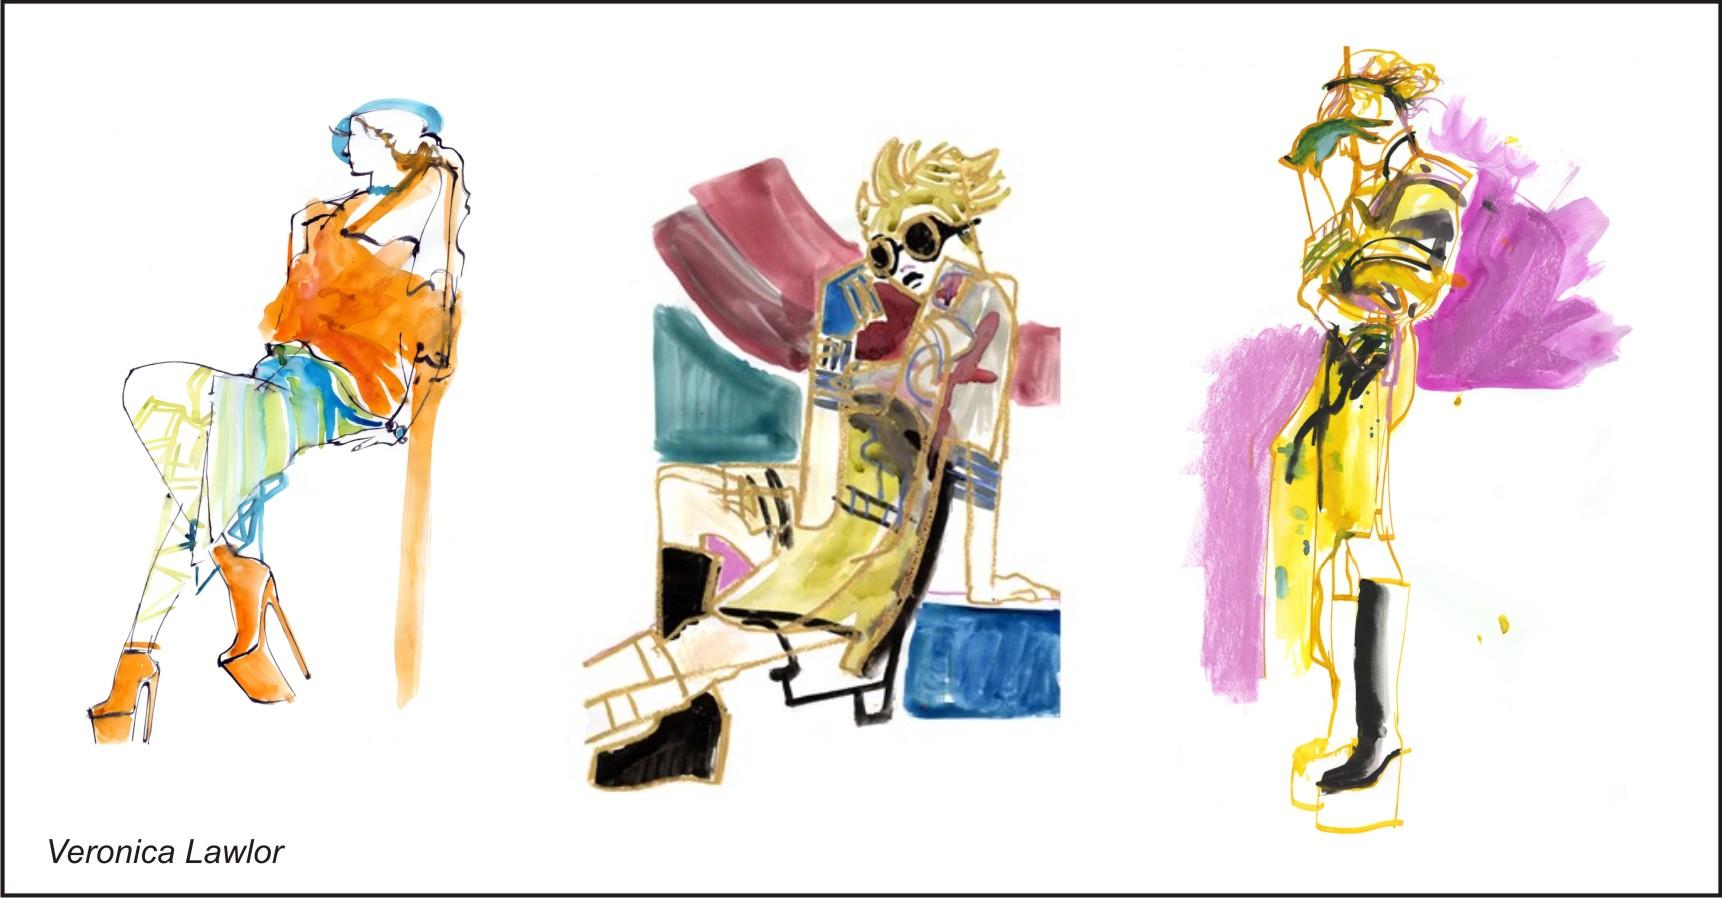 veronica-lawlor-ilustration